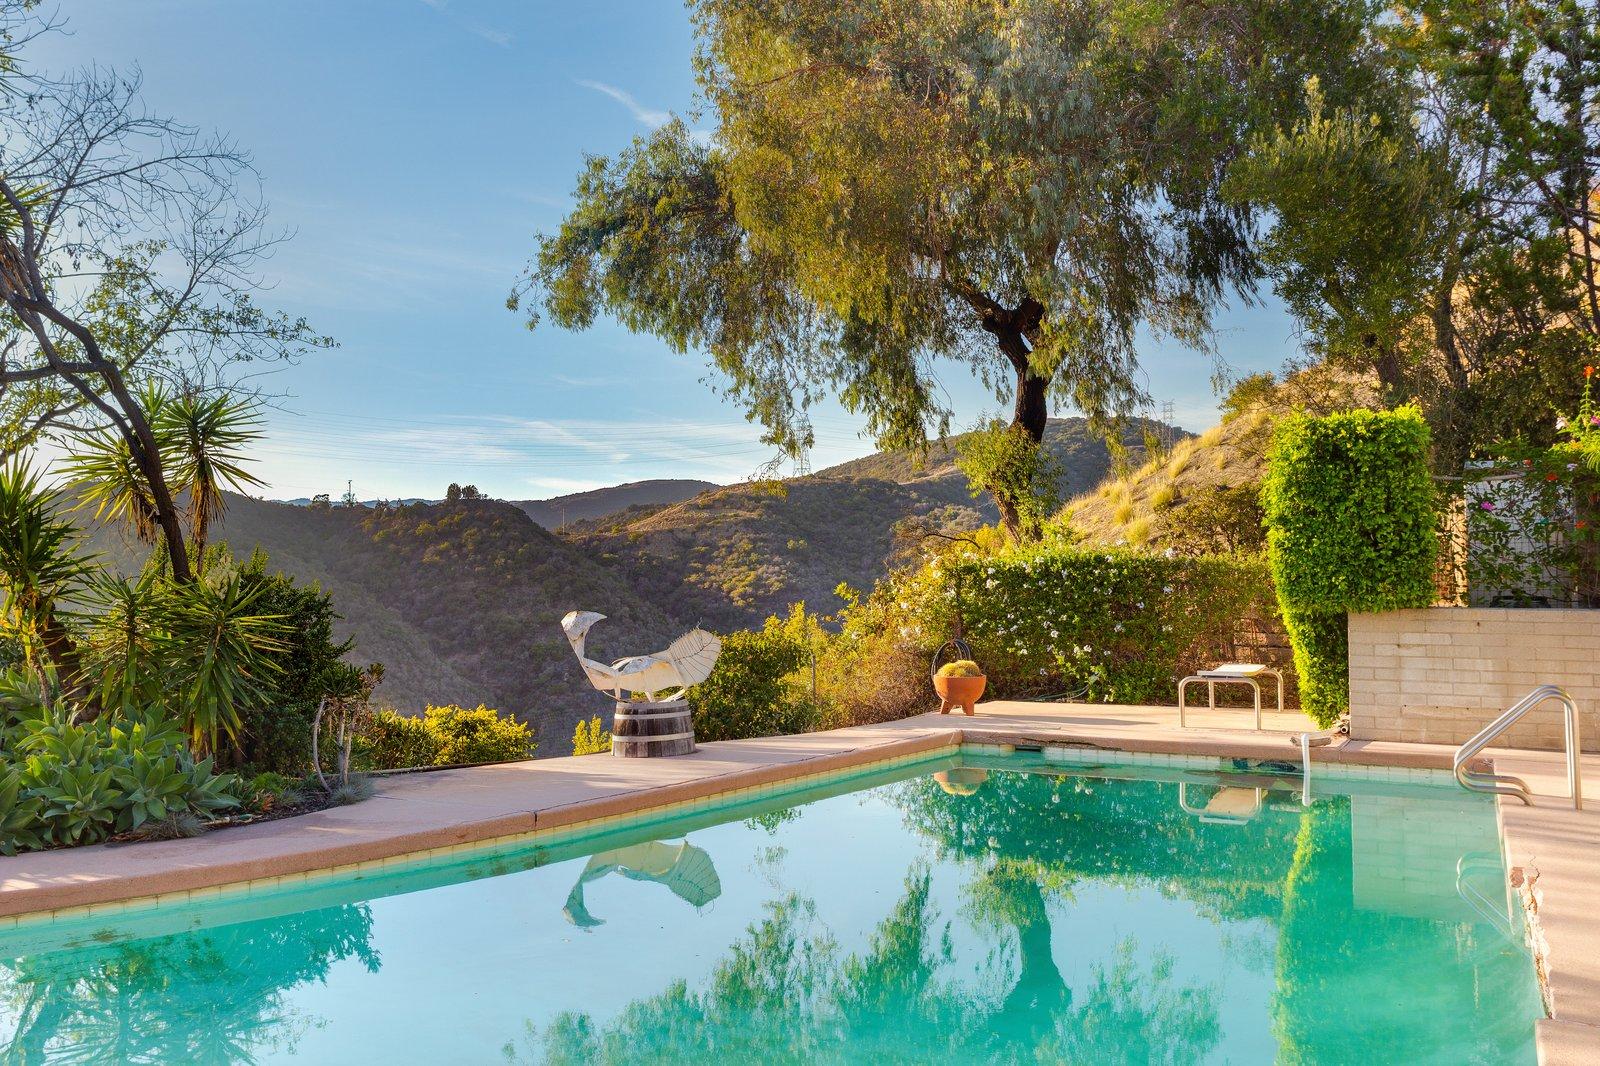 Midcentury modern Neutra home poolside views